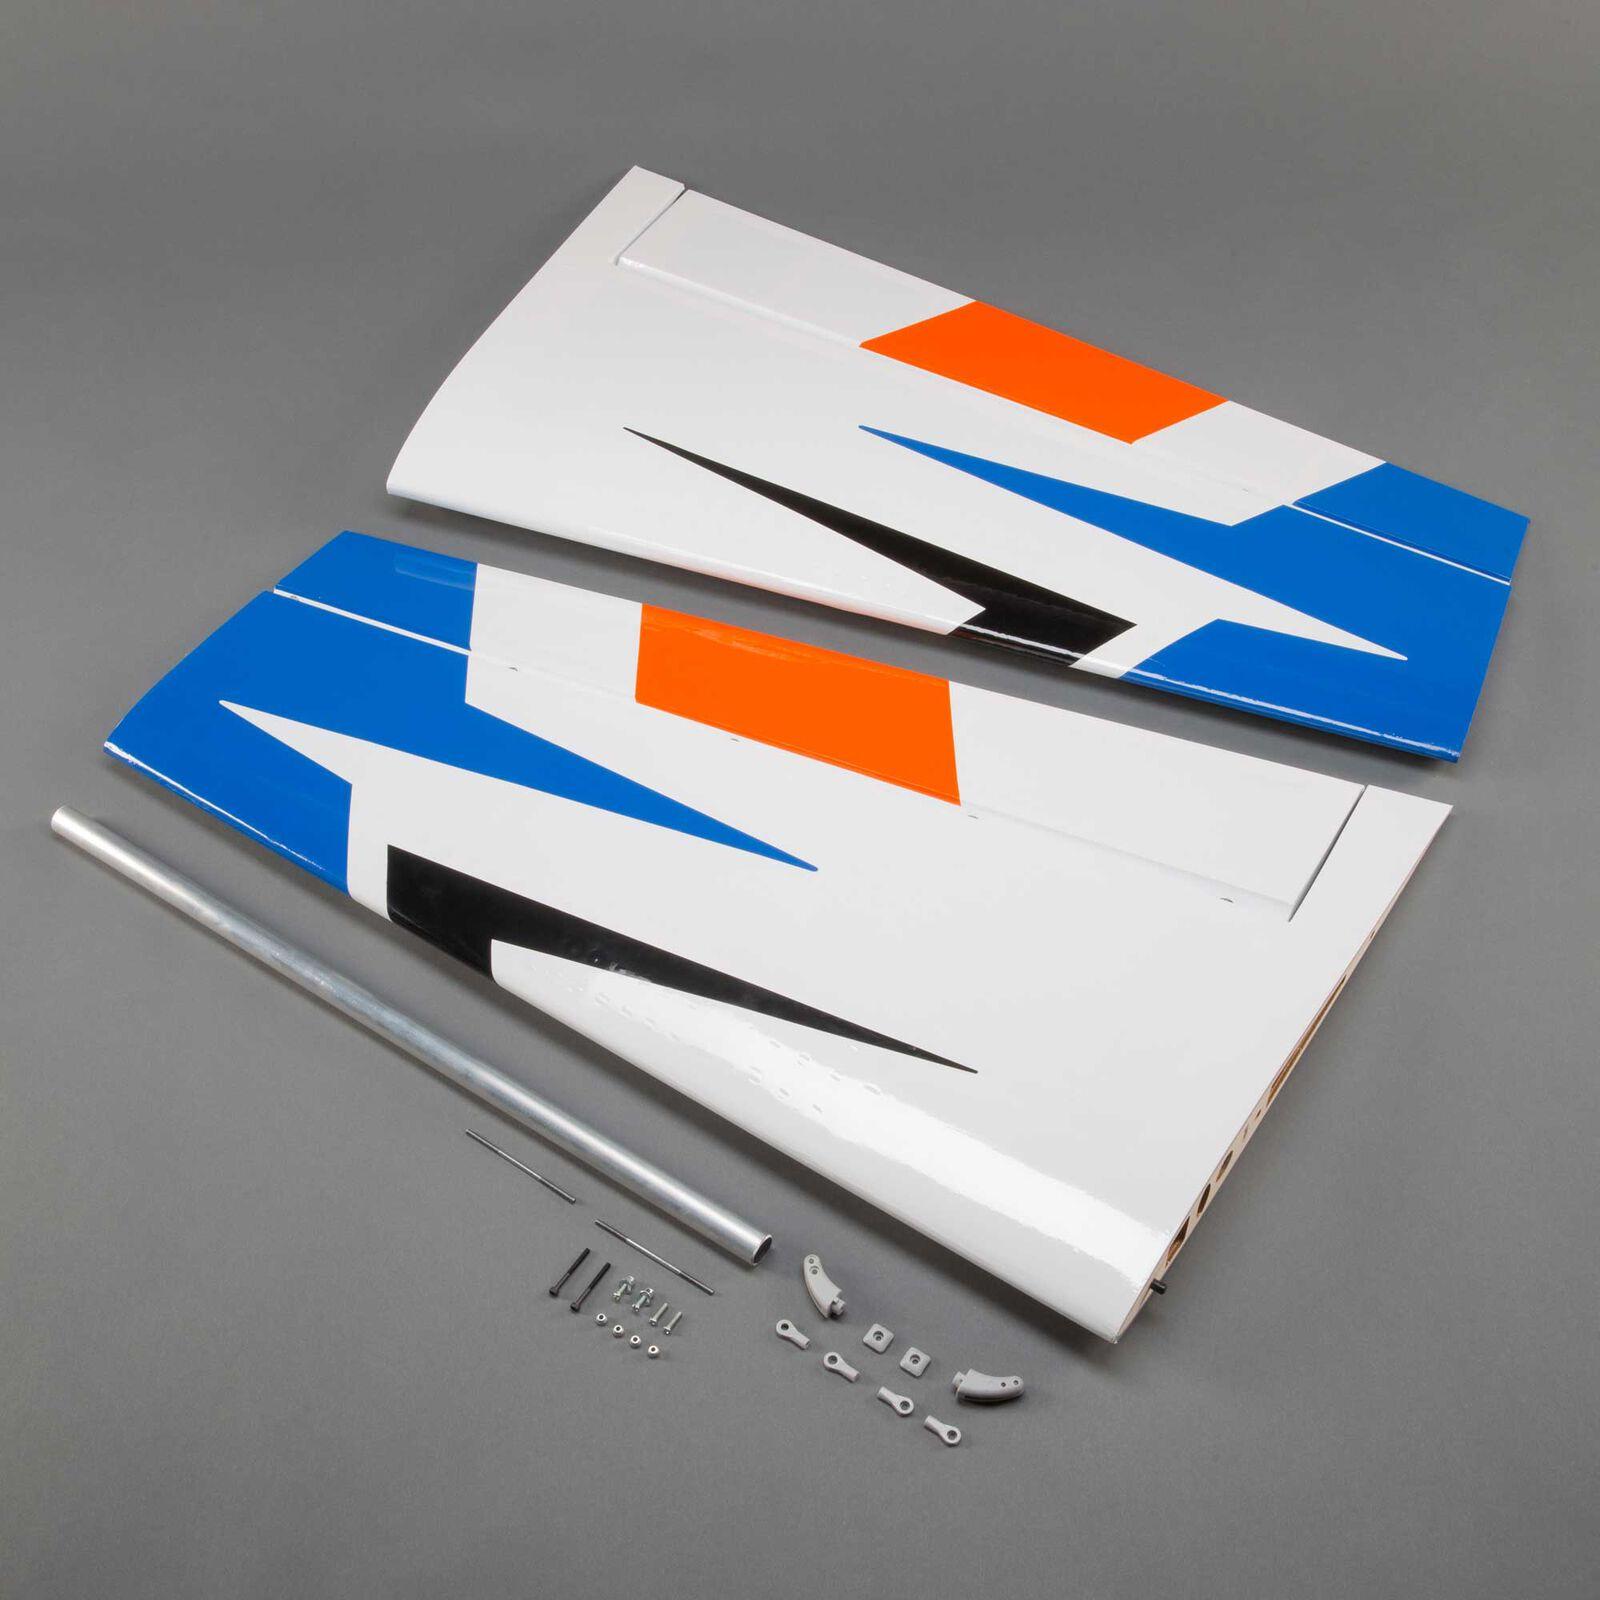 "Wing Set: Slick Aerobat EP 1.20-20cc ARF 67"""